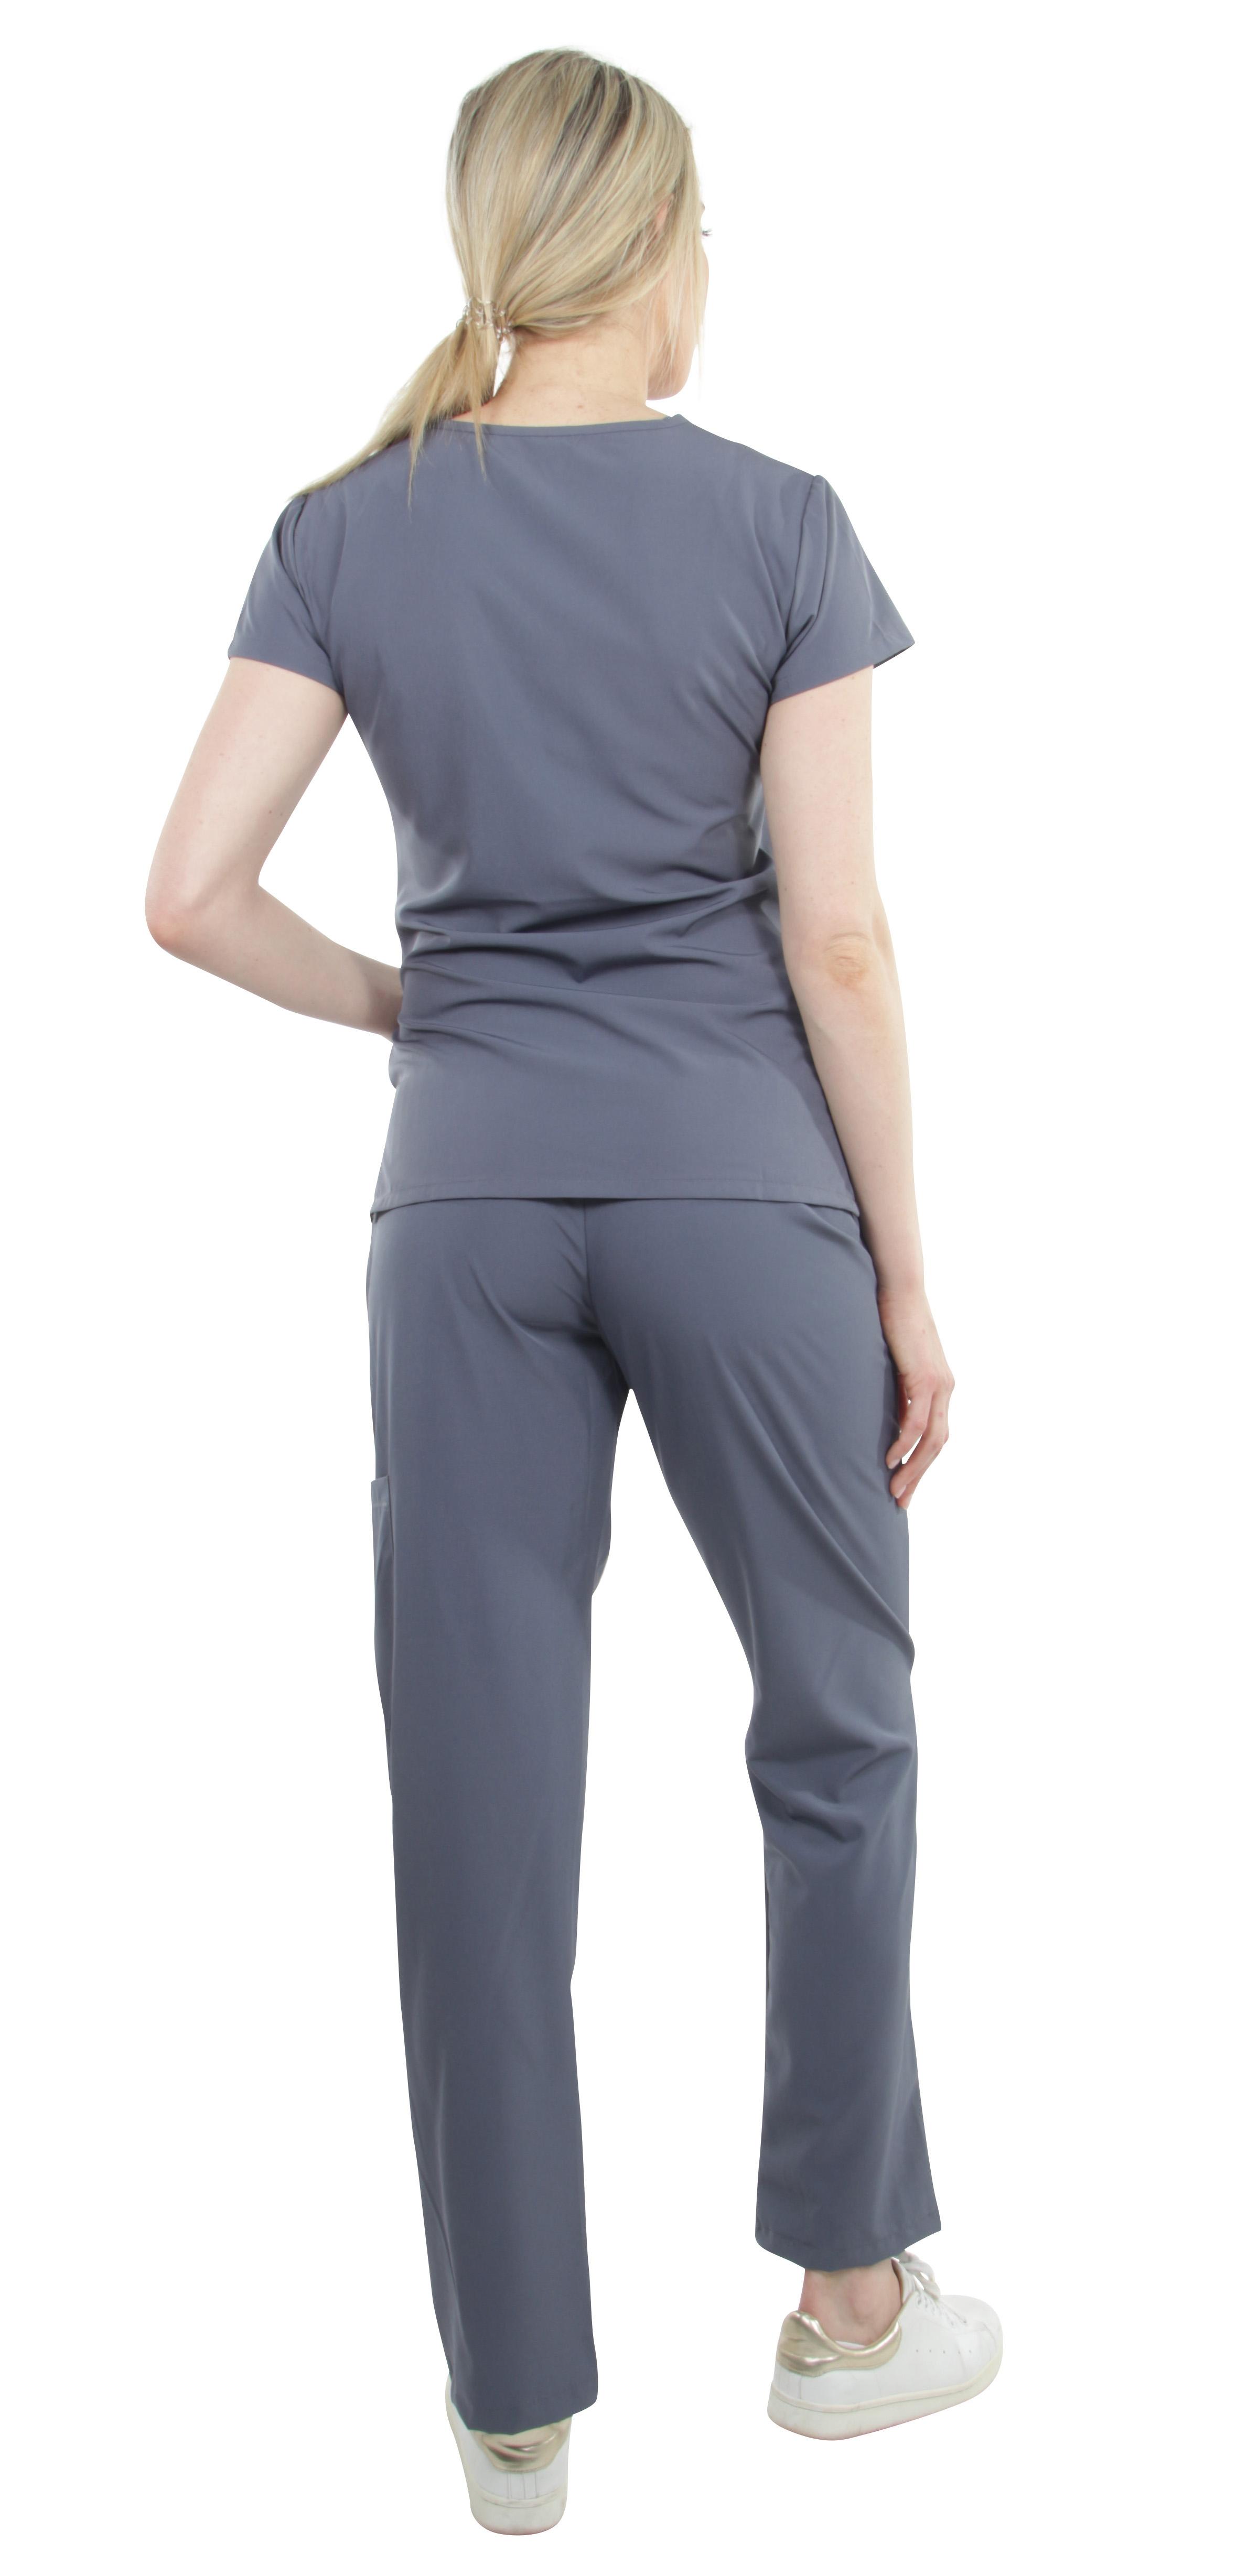 Unisex-Performance-Stretch-Medical-Uniform-Five-Pockets-V-Neck-Scrubs-Sets miniature 32